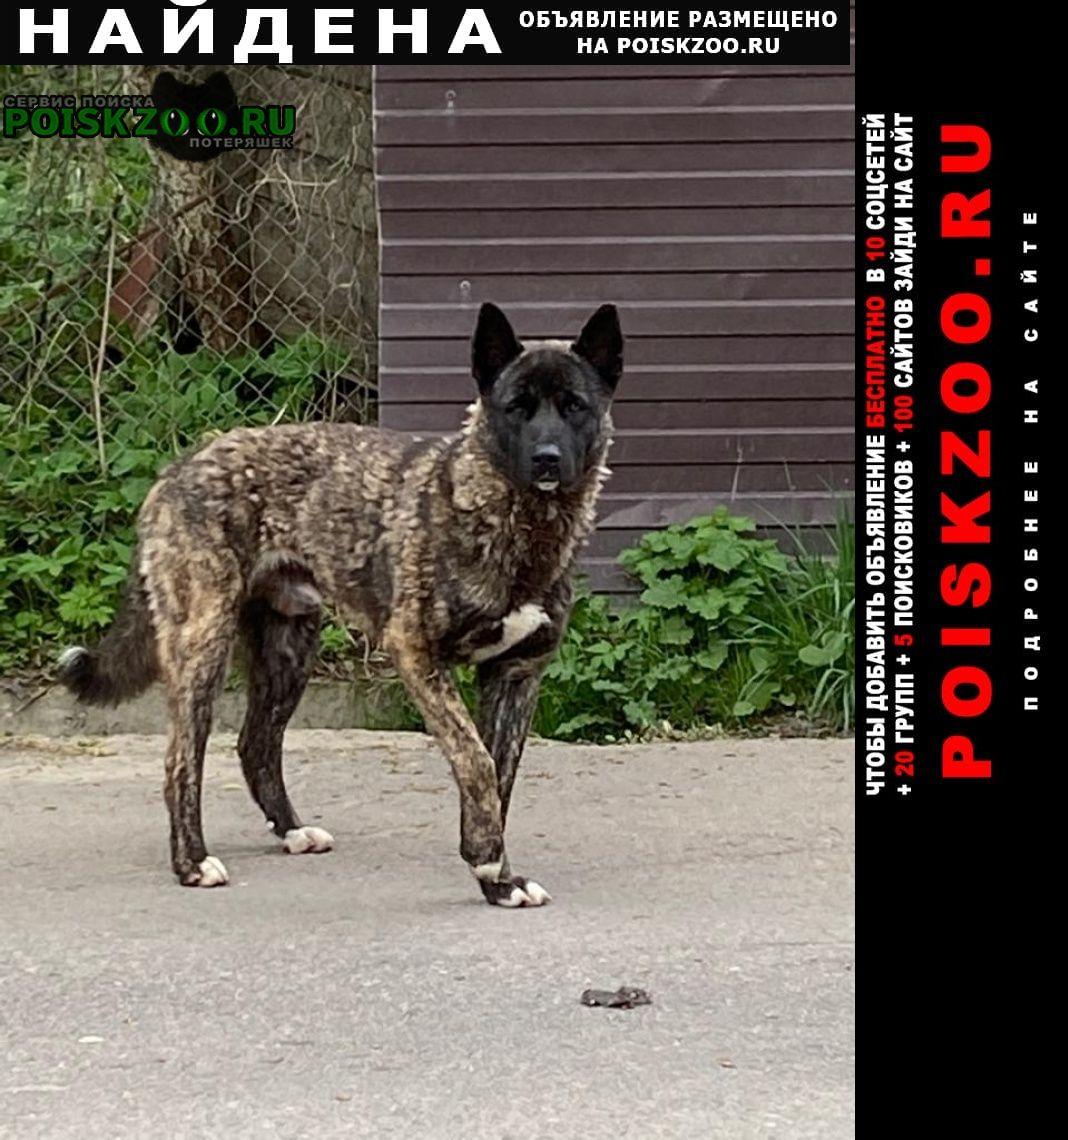 Найдена собака кобель тигровый Одинцово